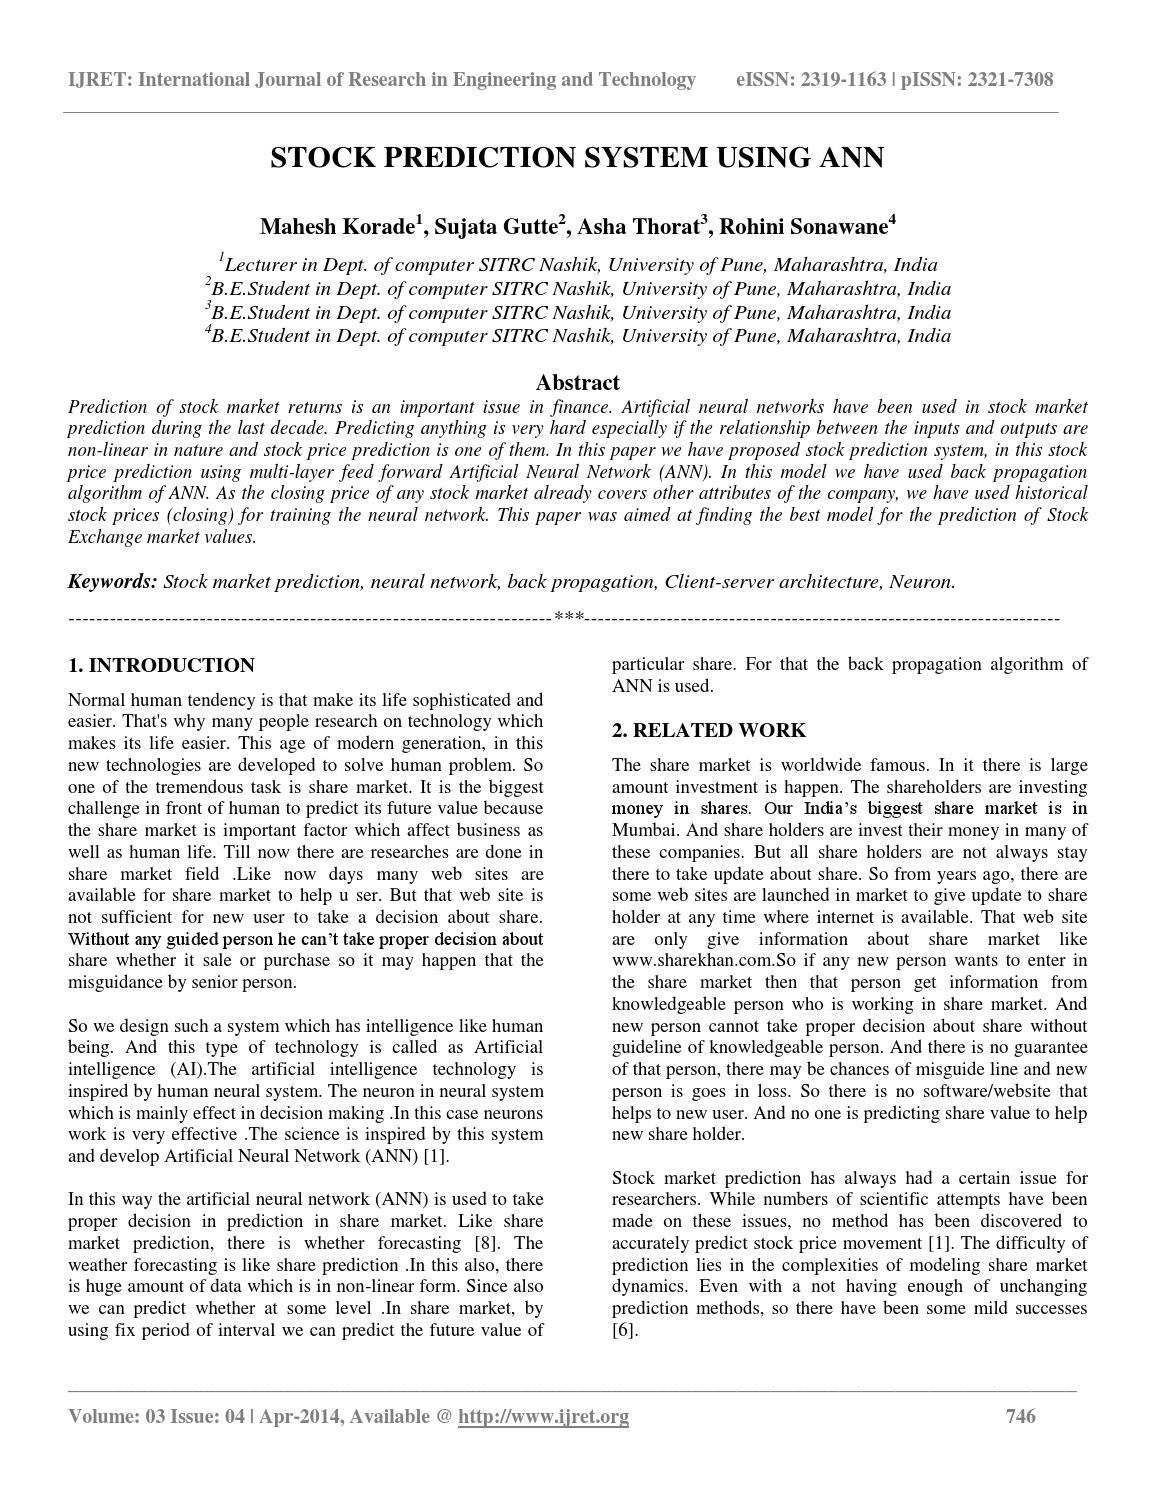 Stock prediction system using ann by IJRET Editor - issuu